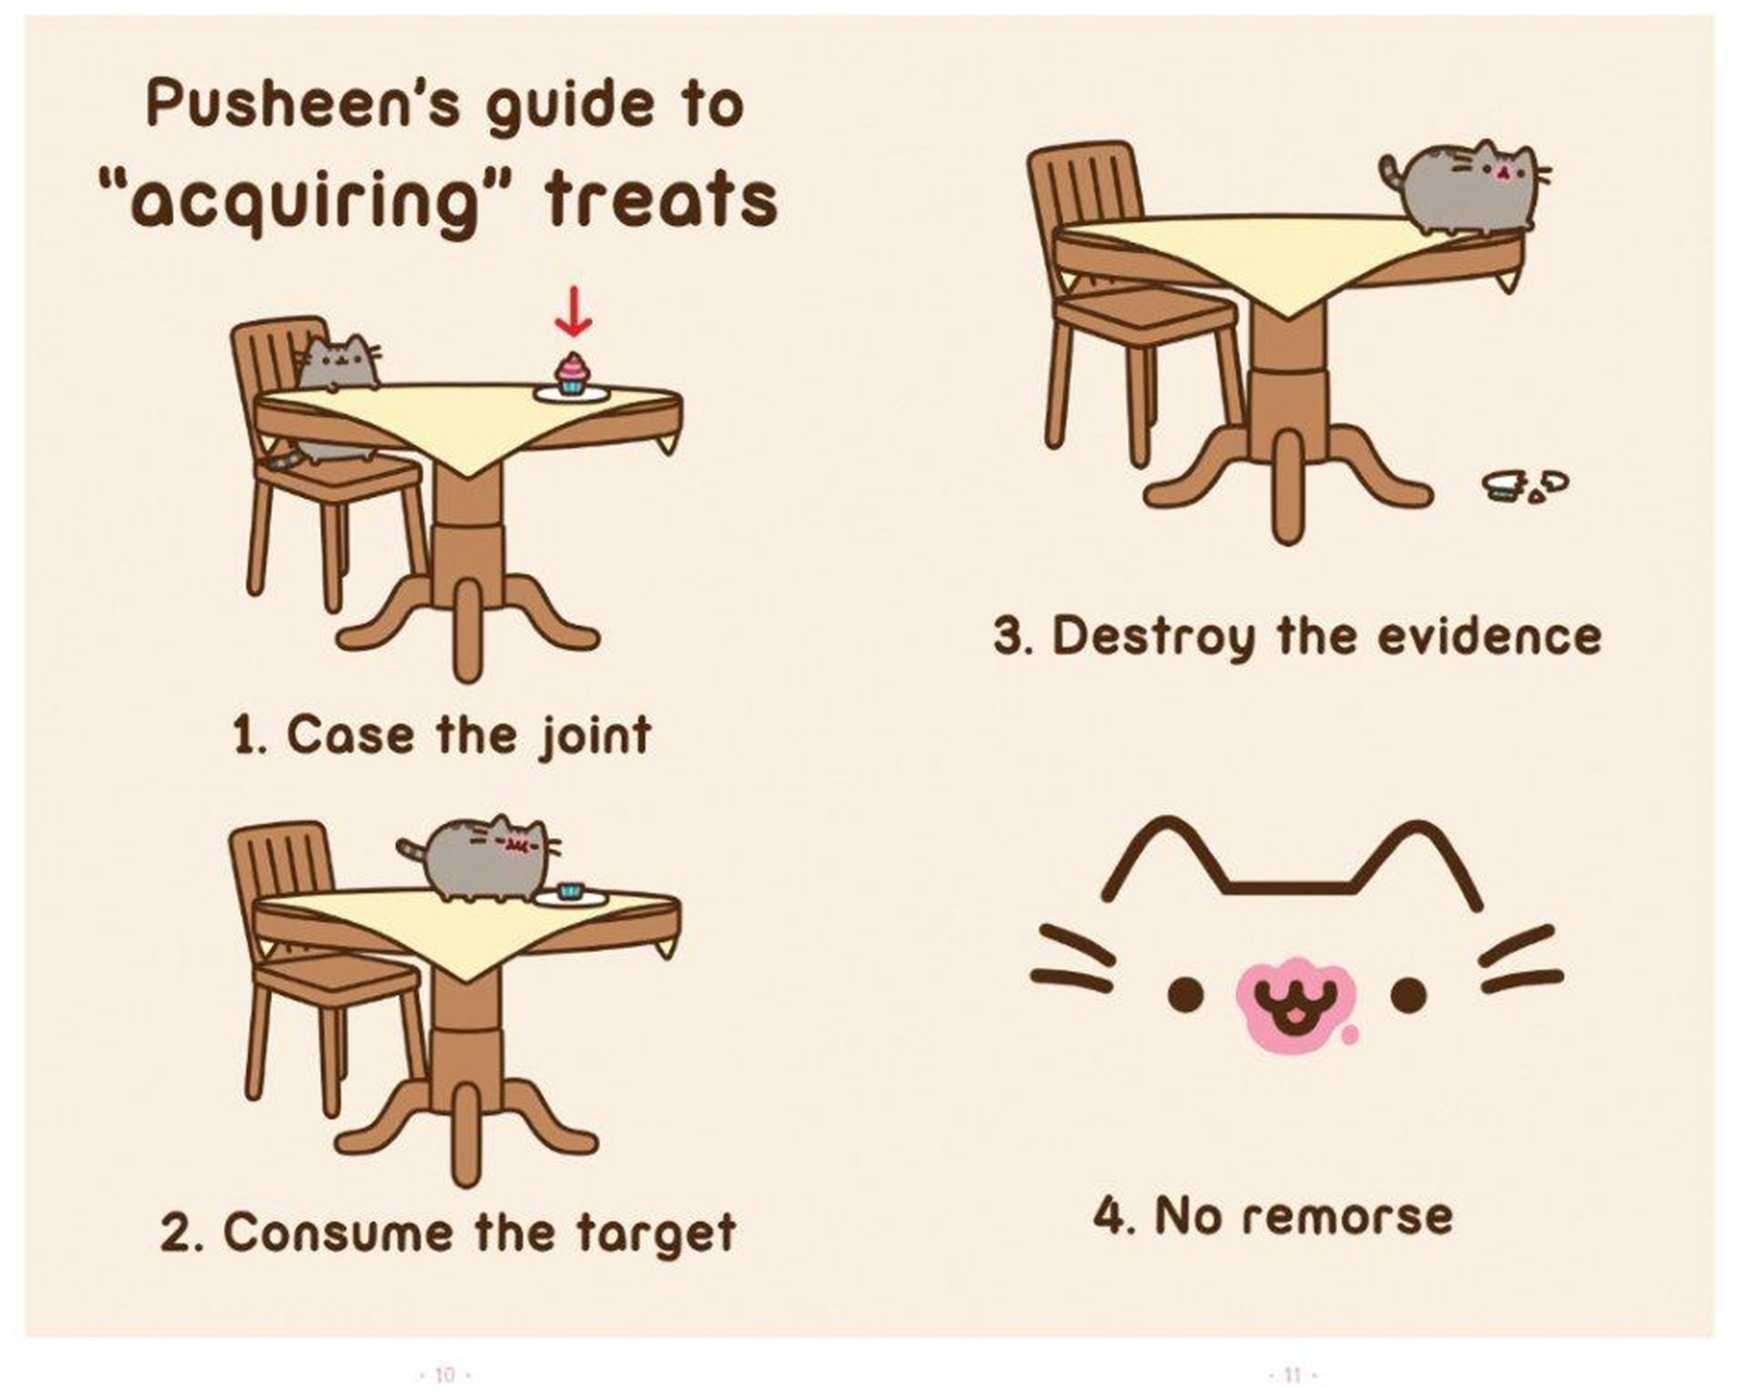 Case Design phone case wiki : Am Pusheen The Cat: Amazon.co.uk: Claire Belton: 8601404318603 ...